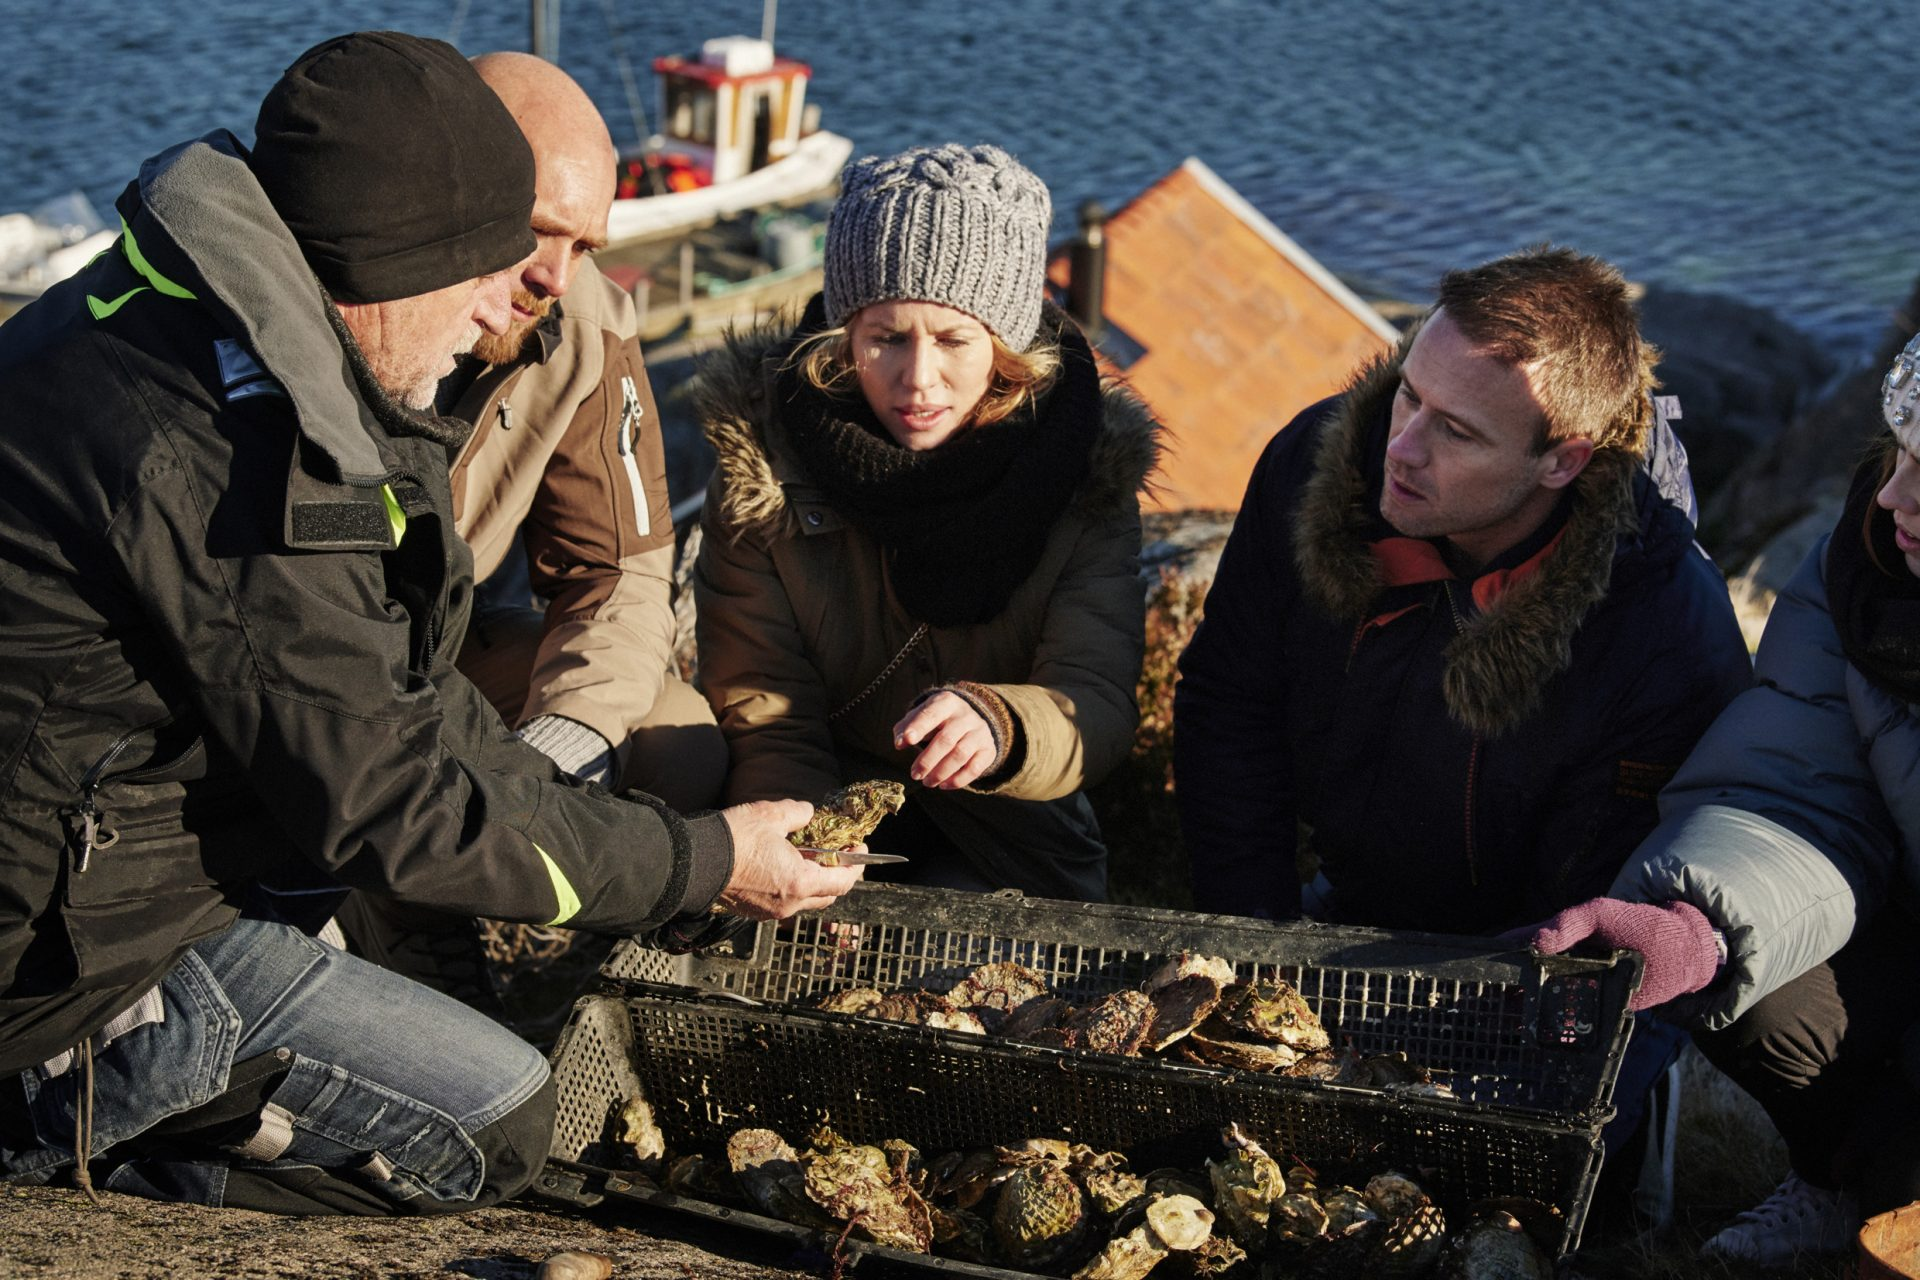 felix_odell-oyster_fishing-7371